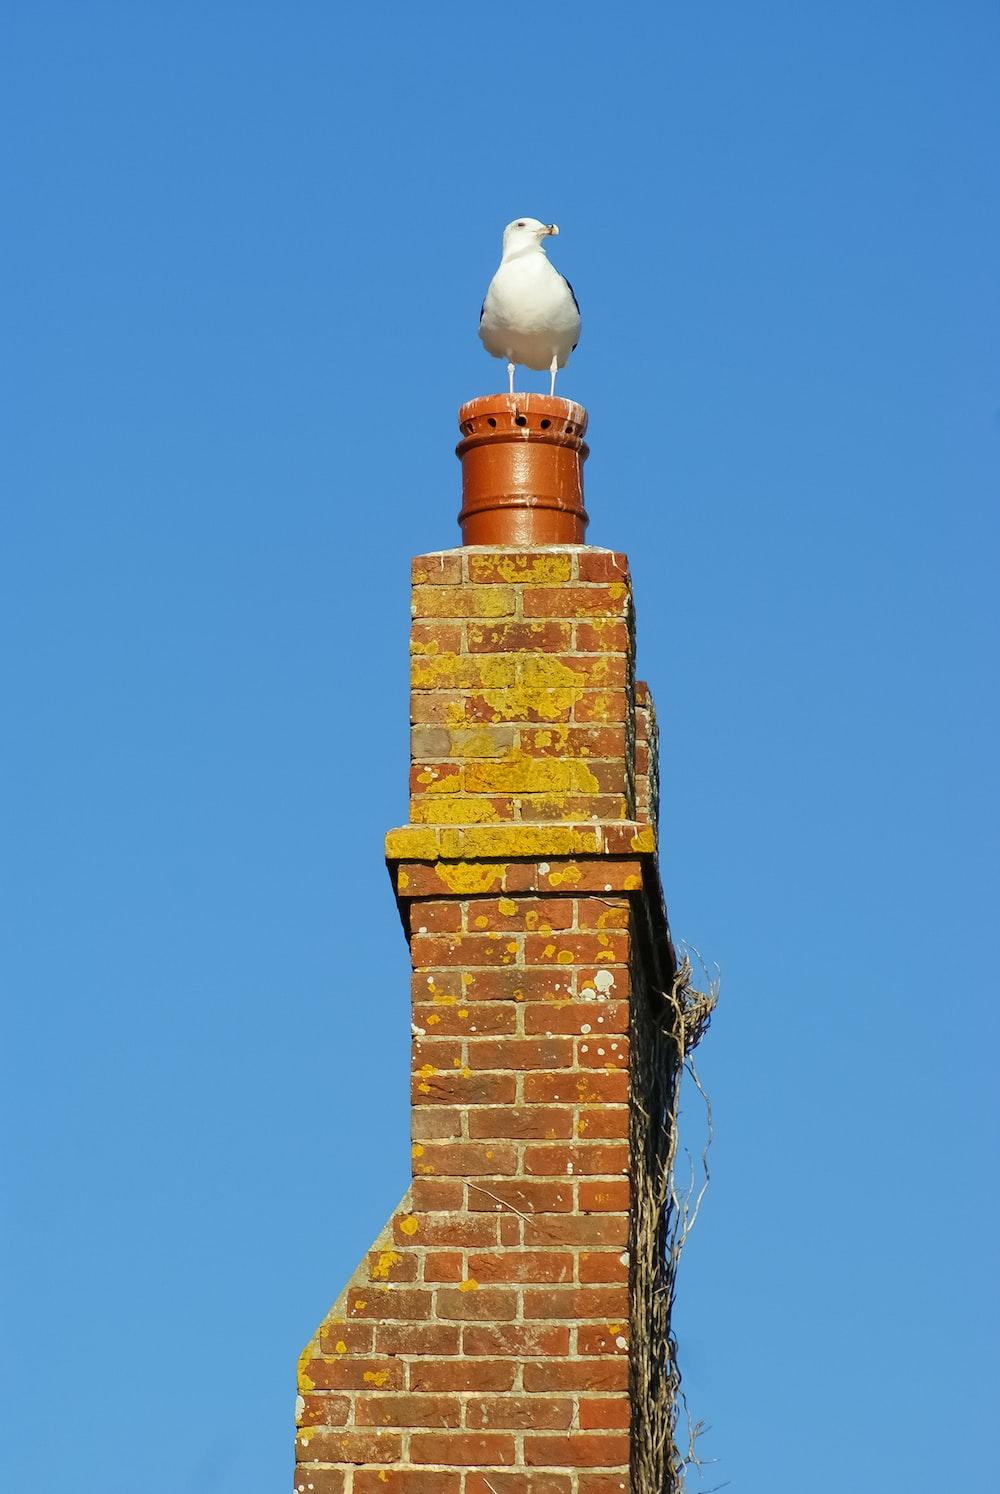 brown brick tower under blue sky during daytime